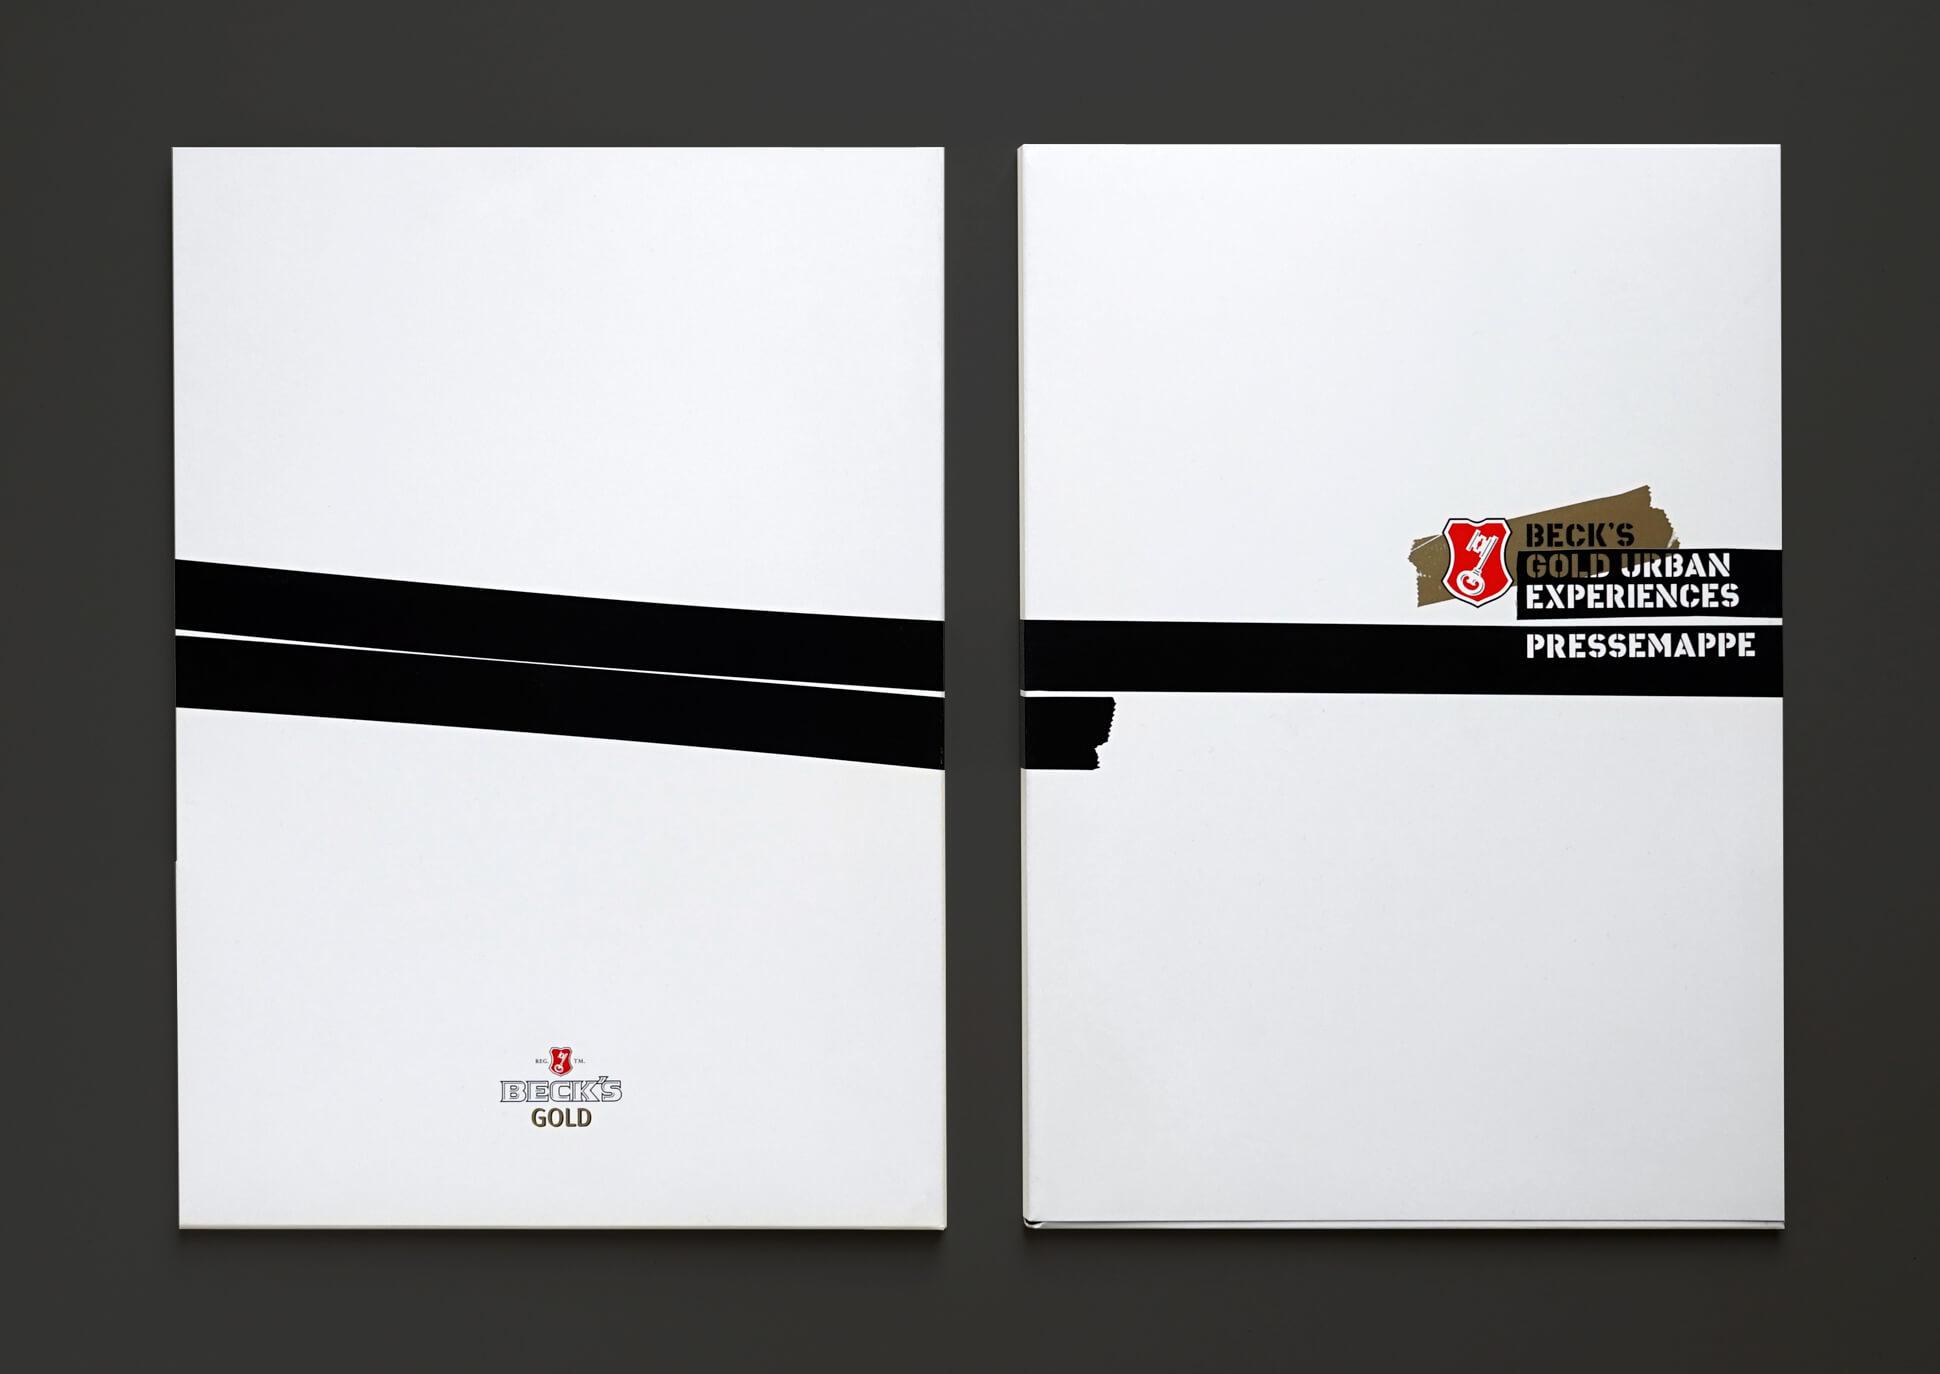 Becks-Gold-Experiences-Pressemappe-F-B